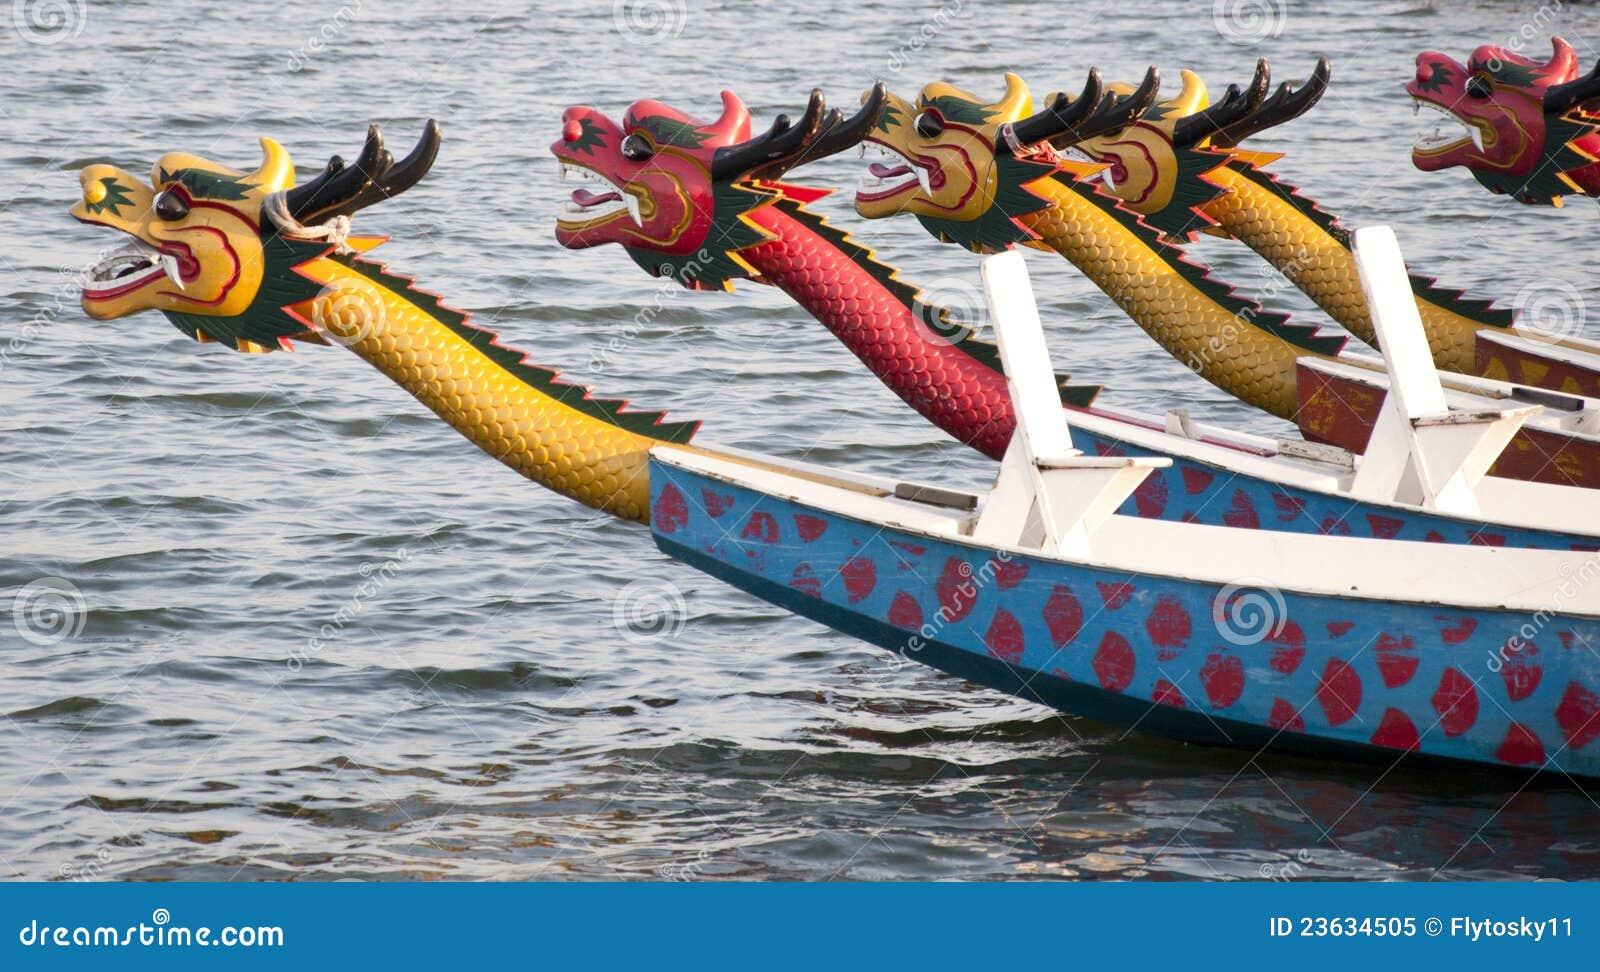 Dragon Boat Royalty Free Stock Photo - Image: 23634505